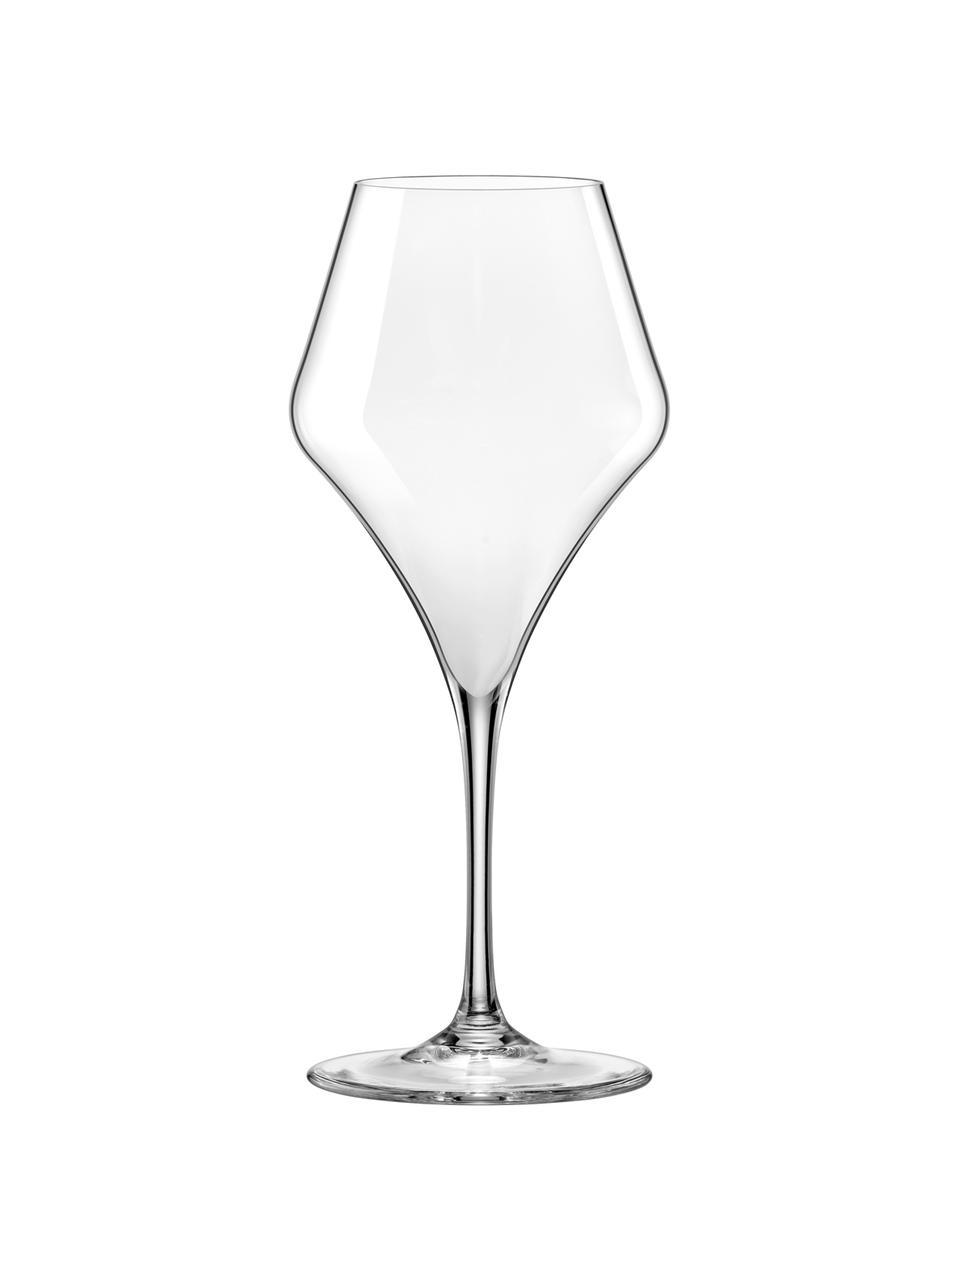 Tulpvormige rode wijnglazen Aram, 6 stuks, Glas, Transparant, Ø 10 x H 24 cm